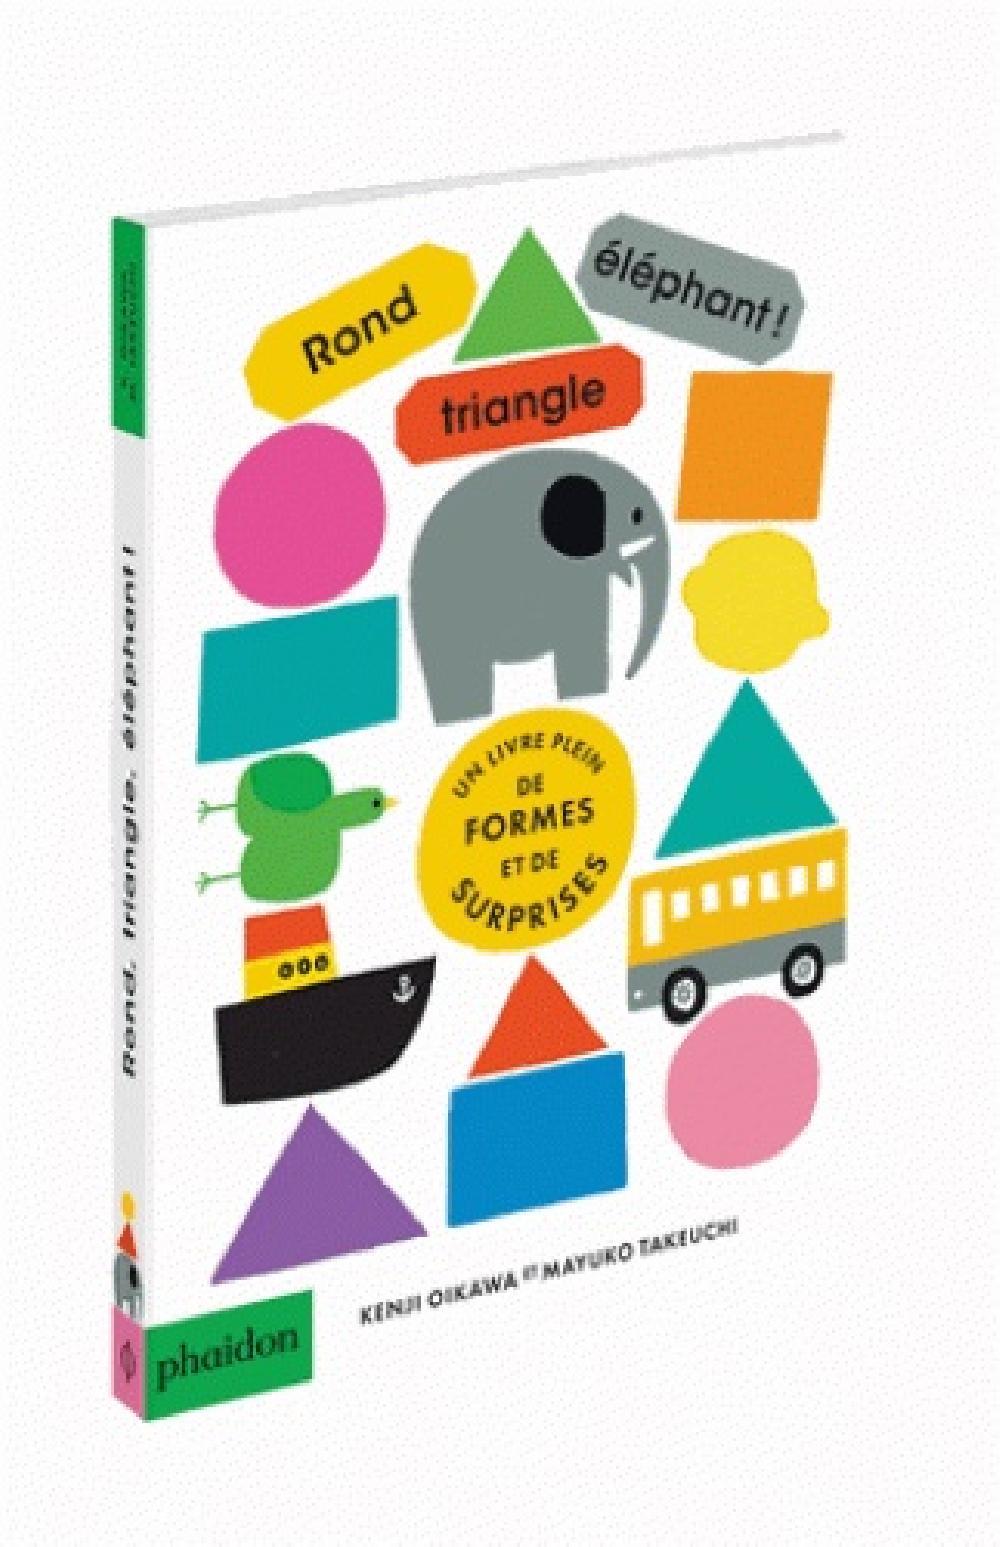 Rond, triangle, éléphant !